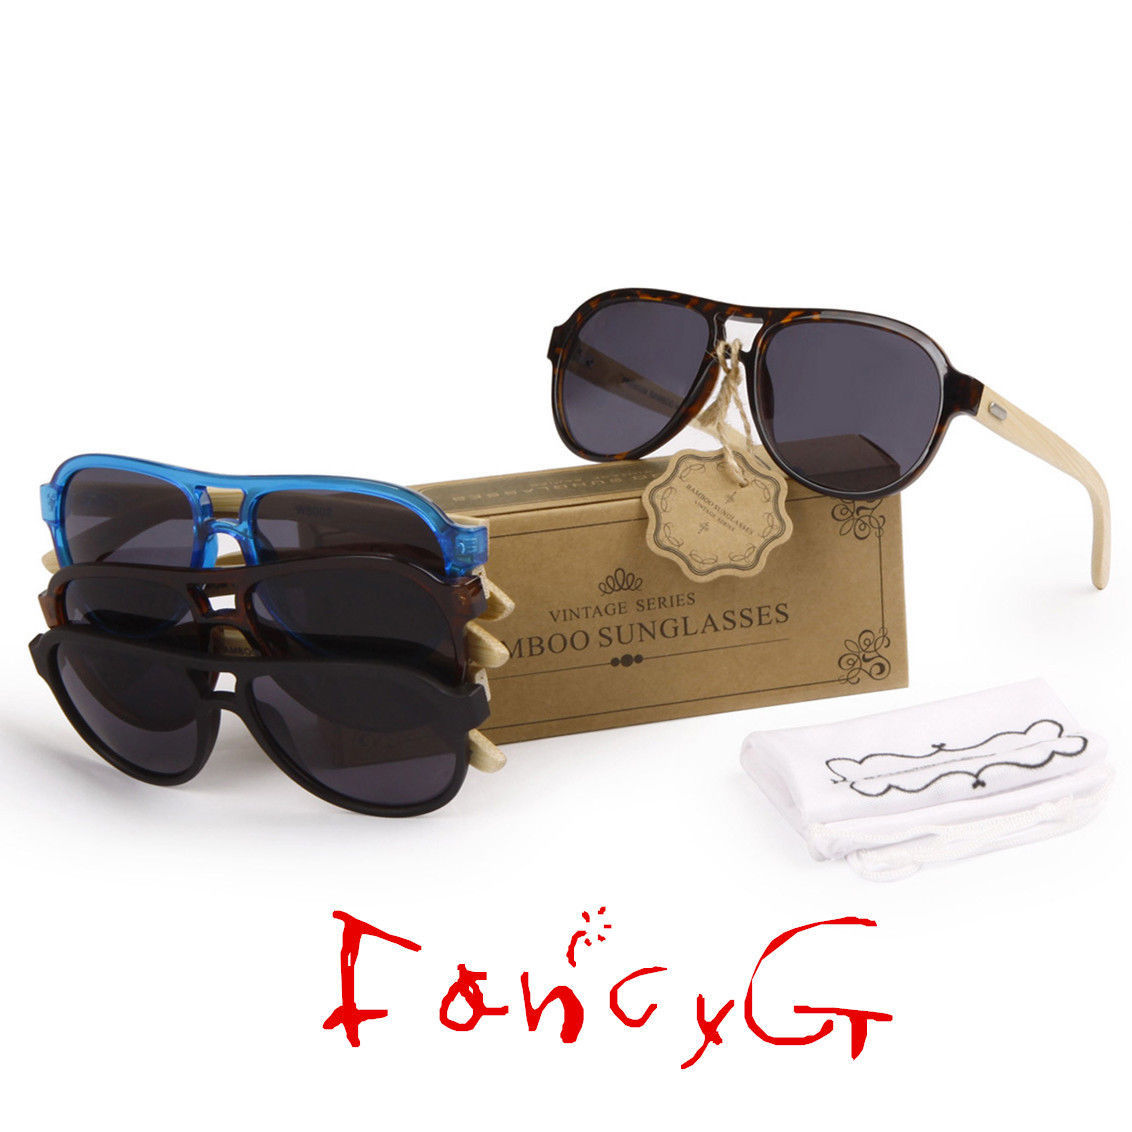 12 Assorted Luxury Style Bamboo Wood Fashion Sunglasses UV 400 Protection